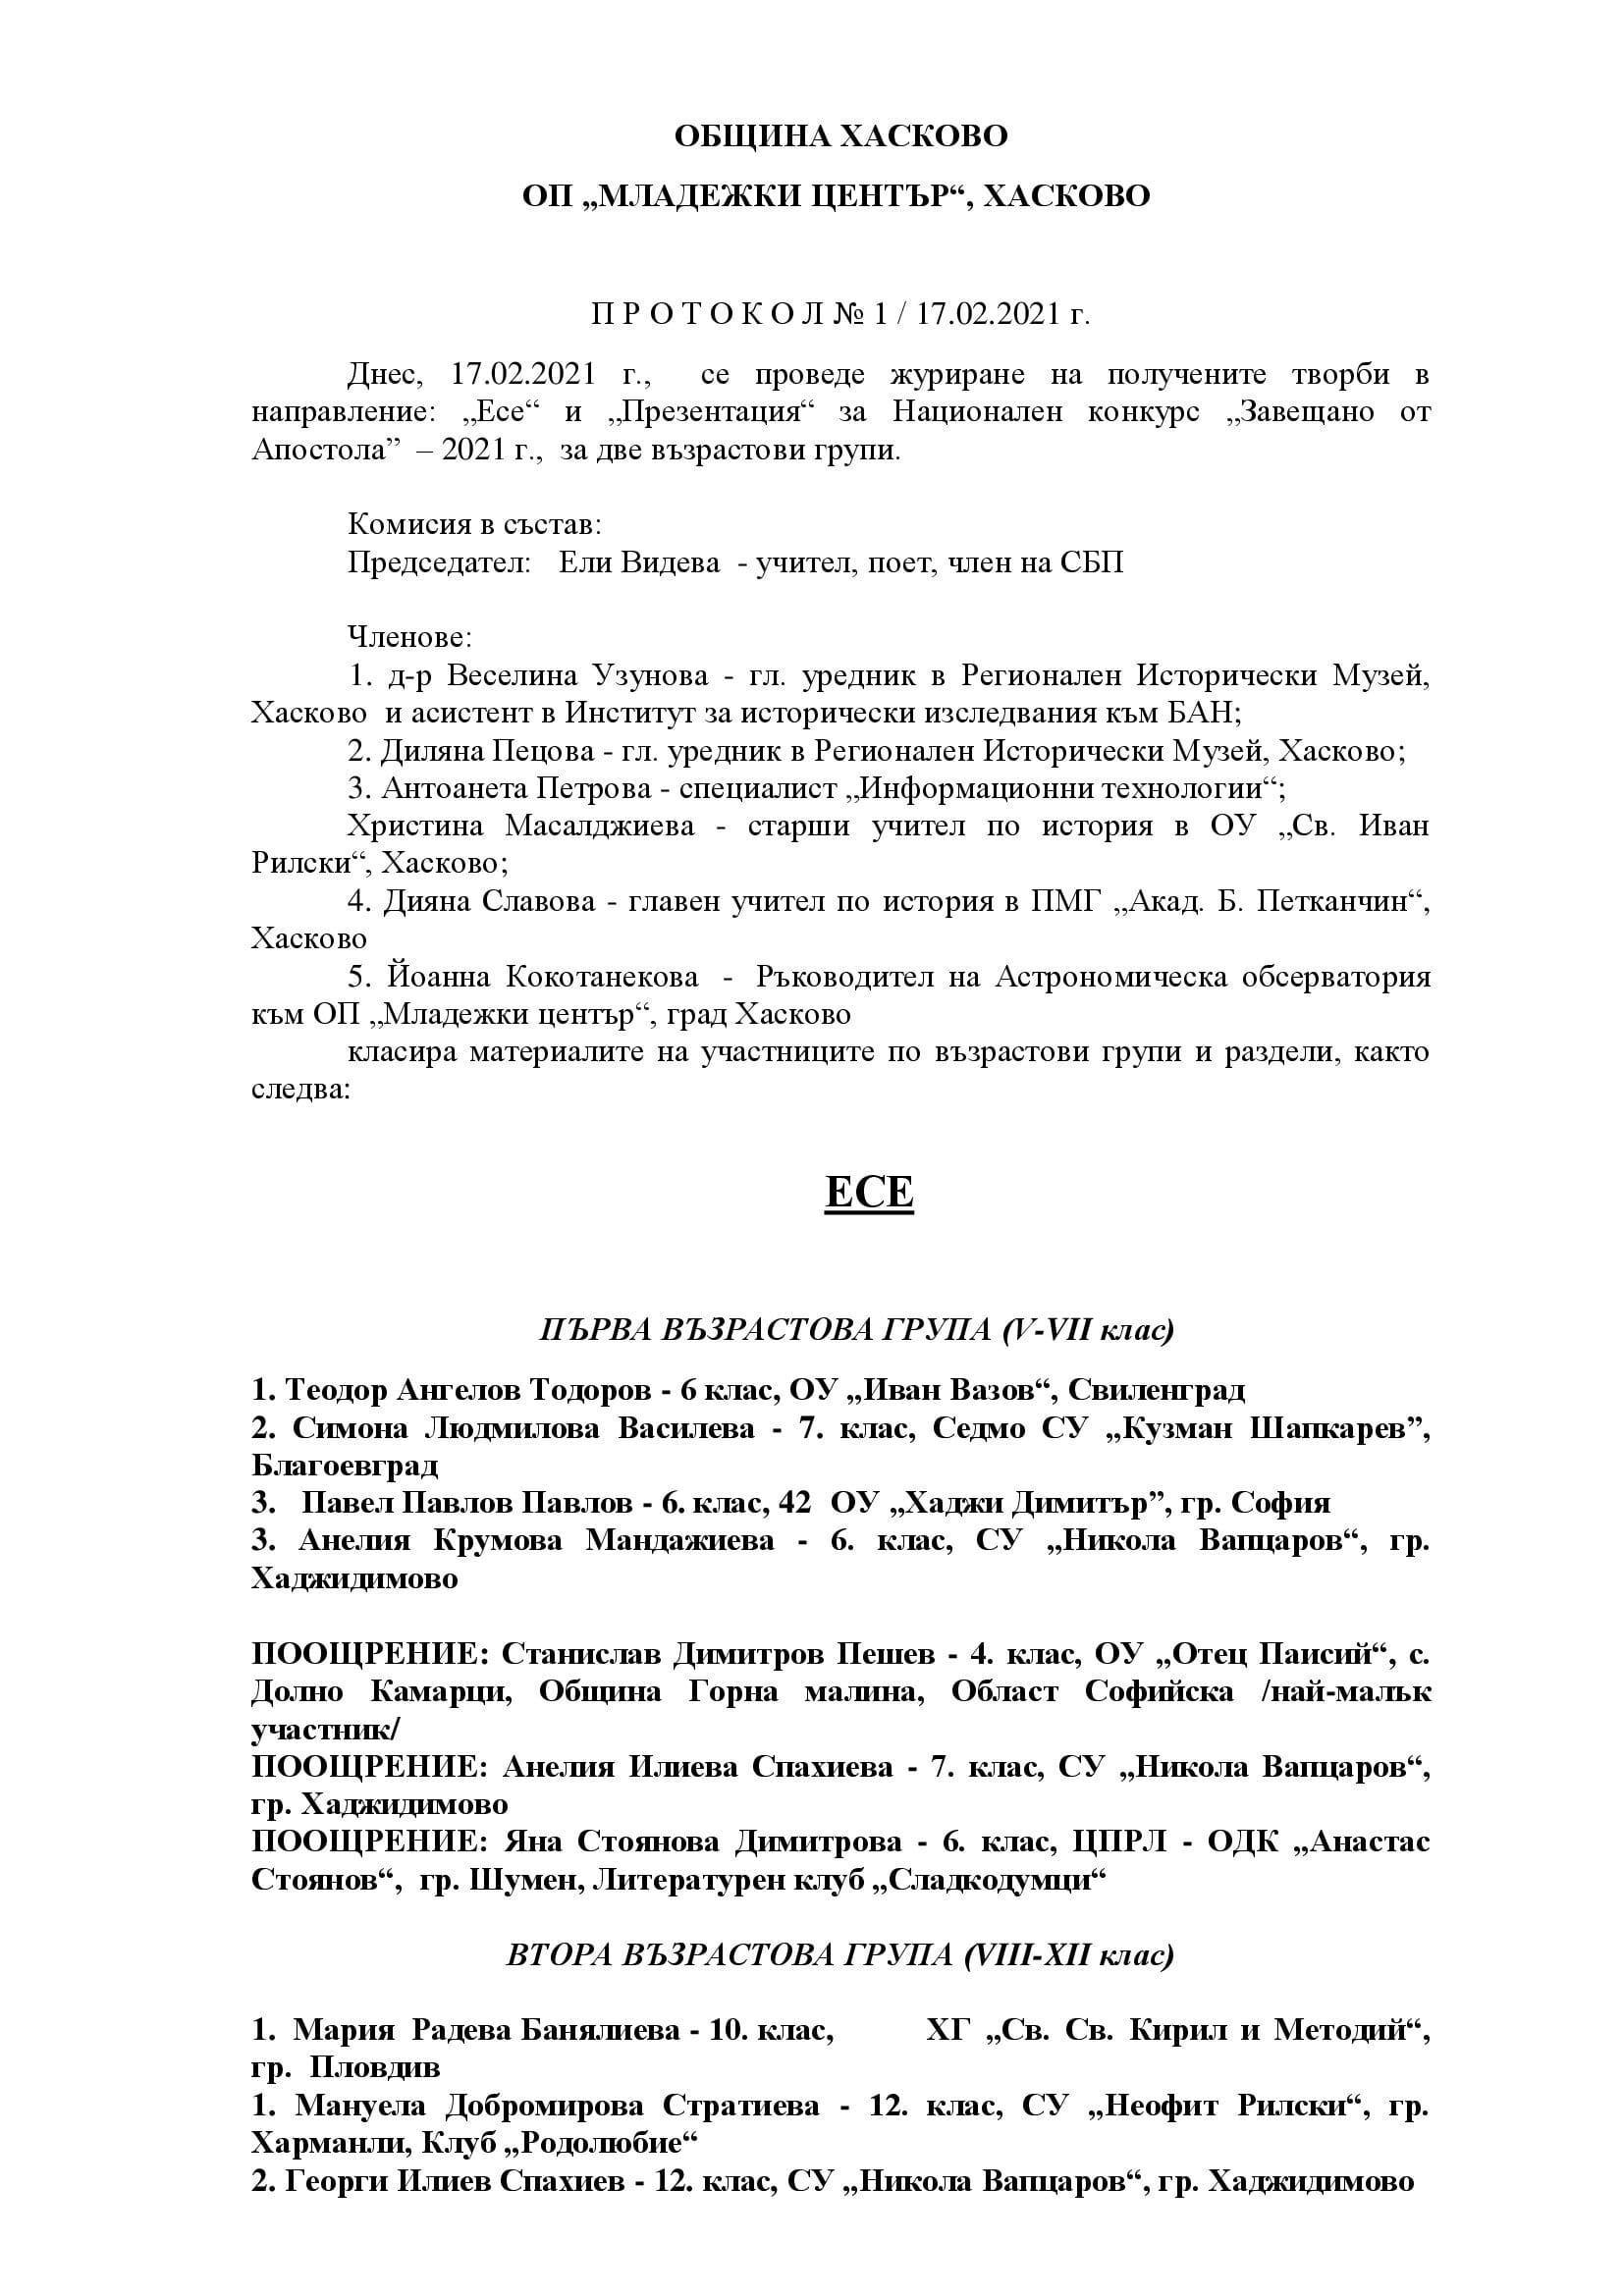 ПРОТОКОЛ В. ЛЕВСКИ_00001